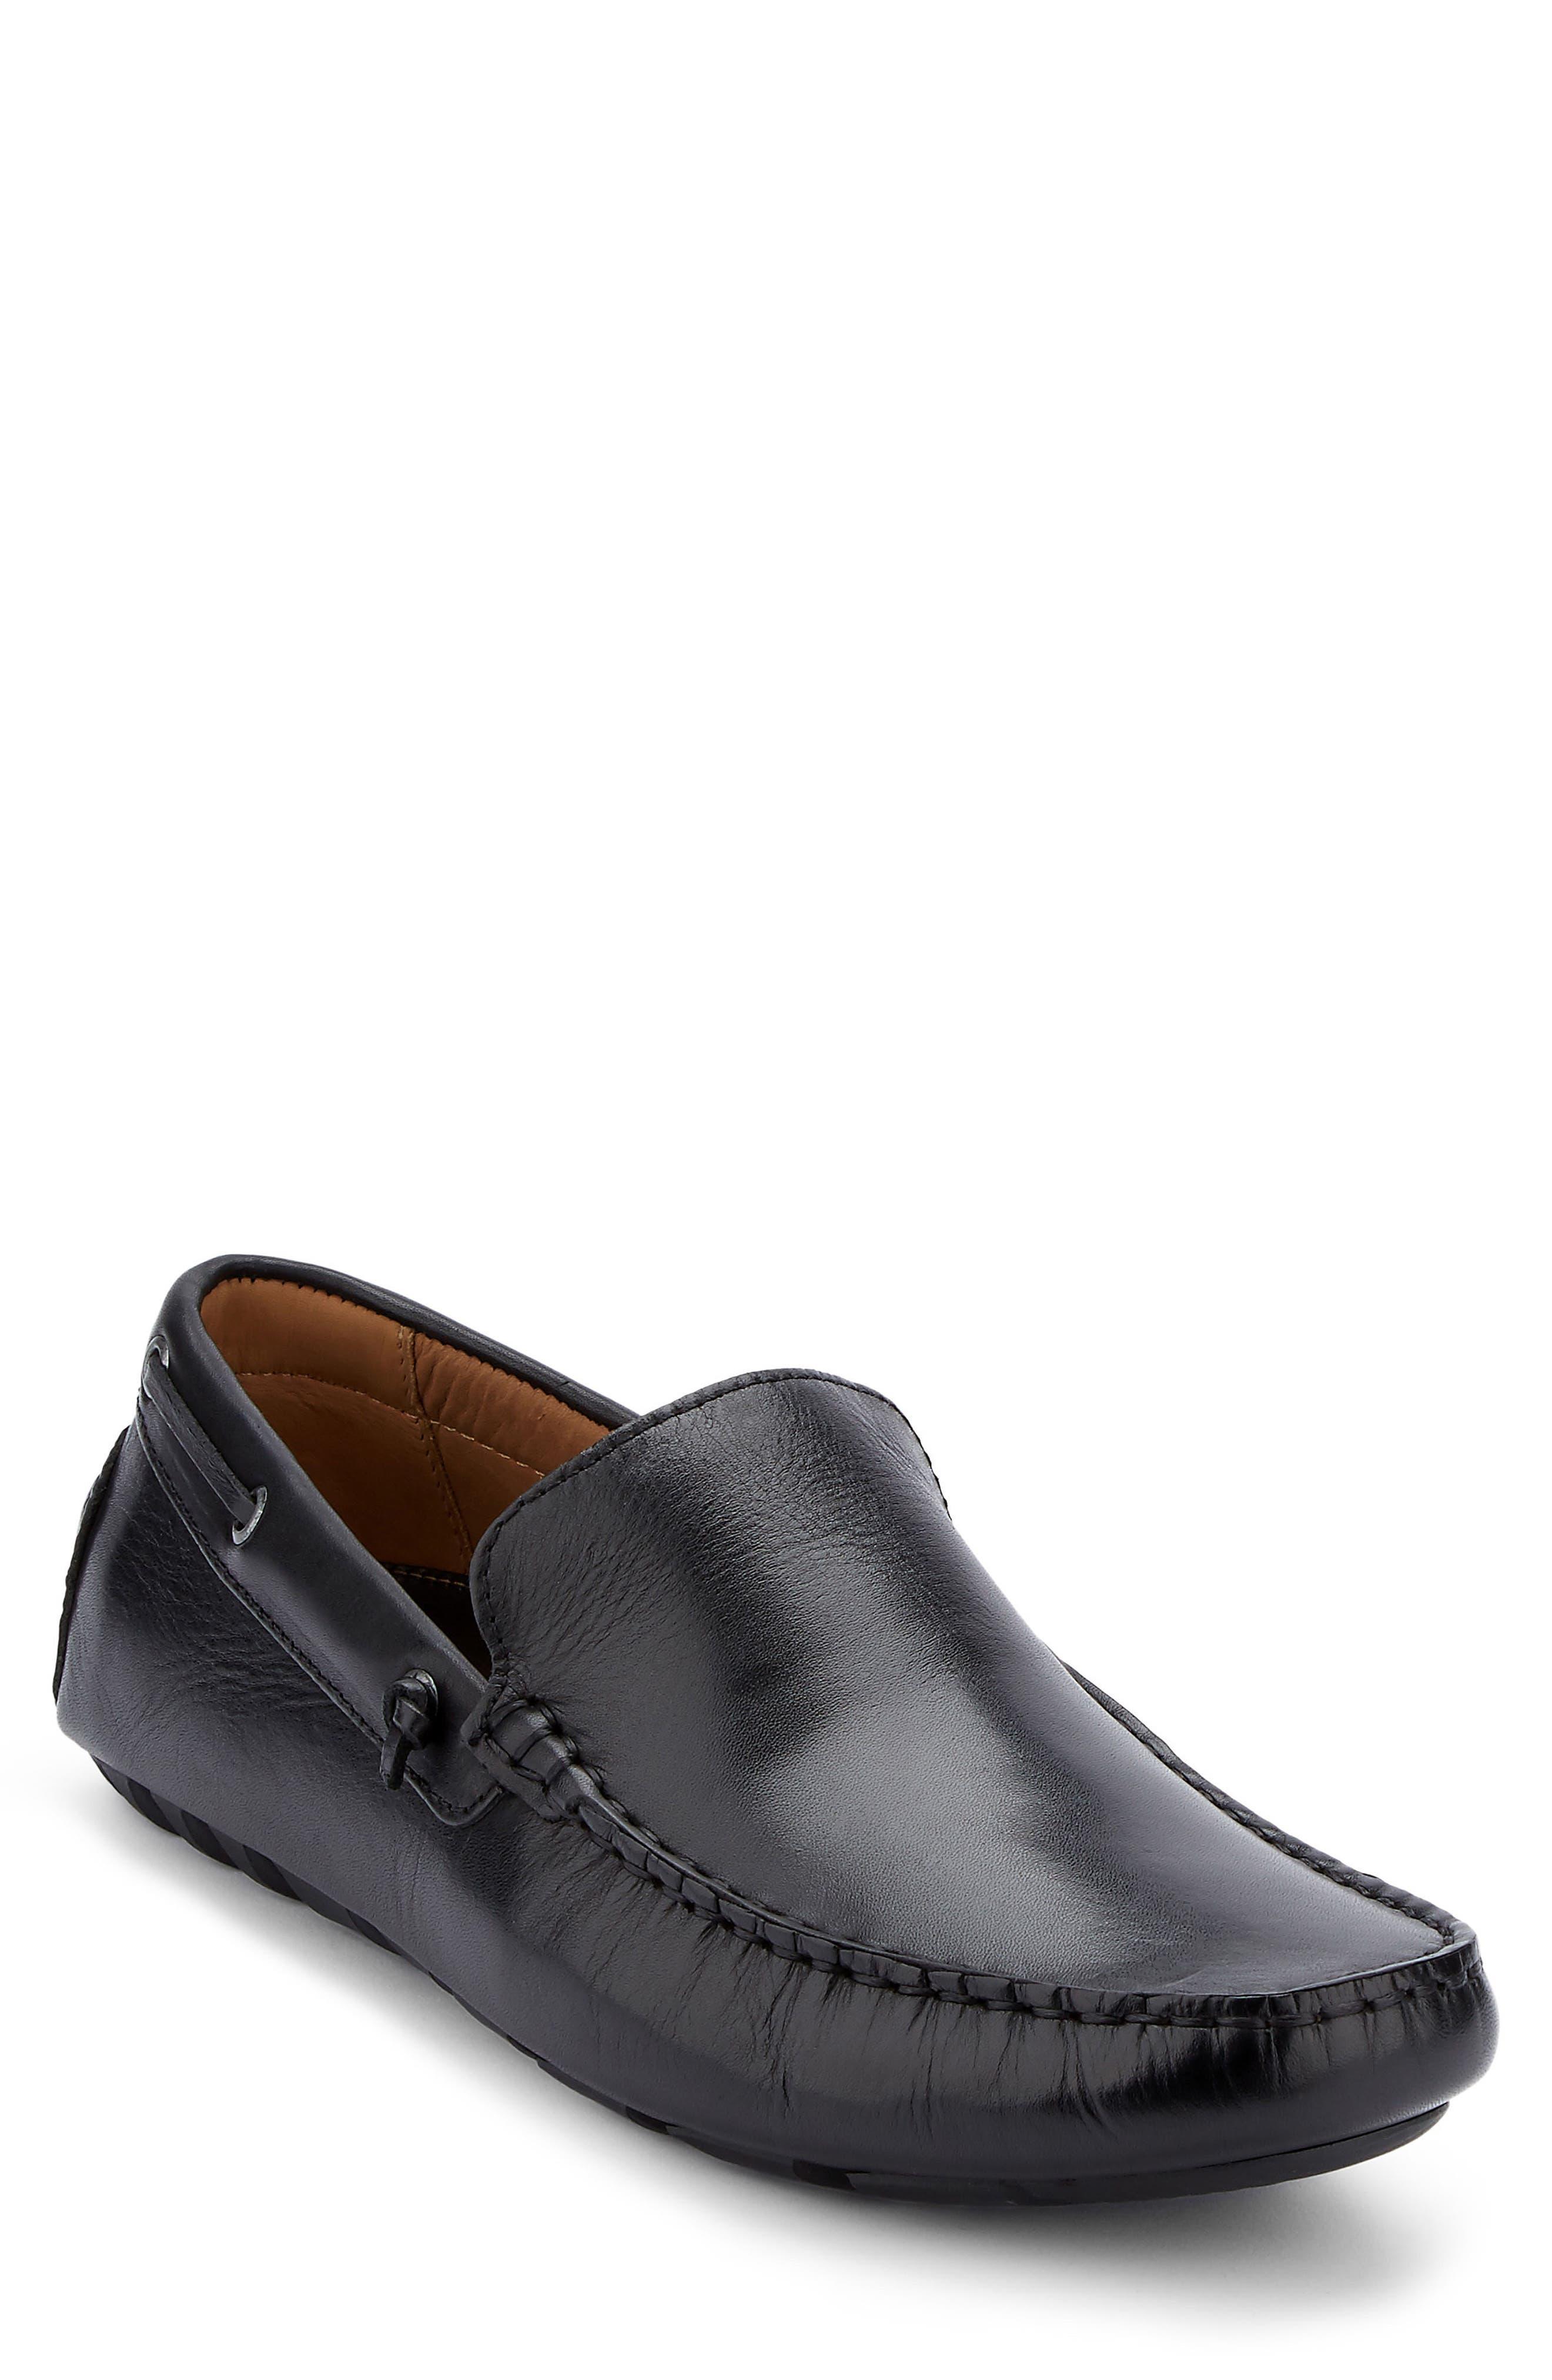 G.H. BASS & CO., Walter Driving Shoe, Main thumbnail 1, color, BLACK